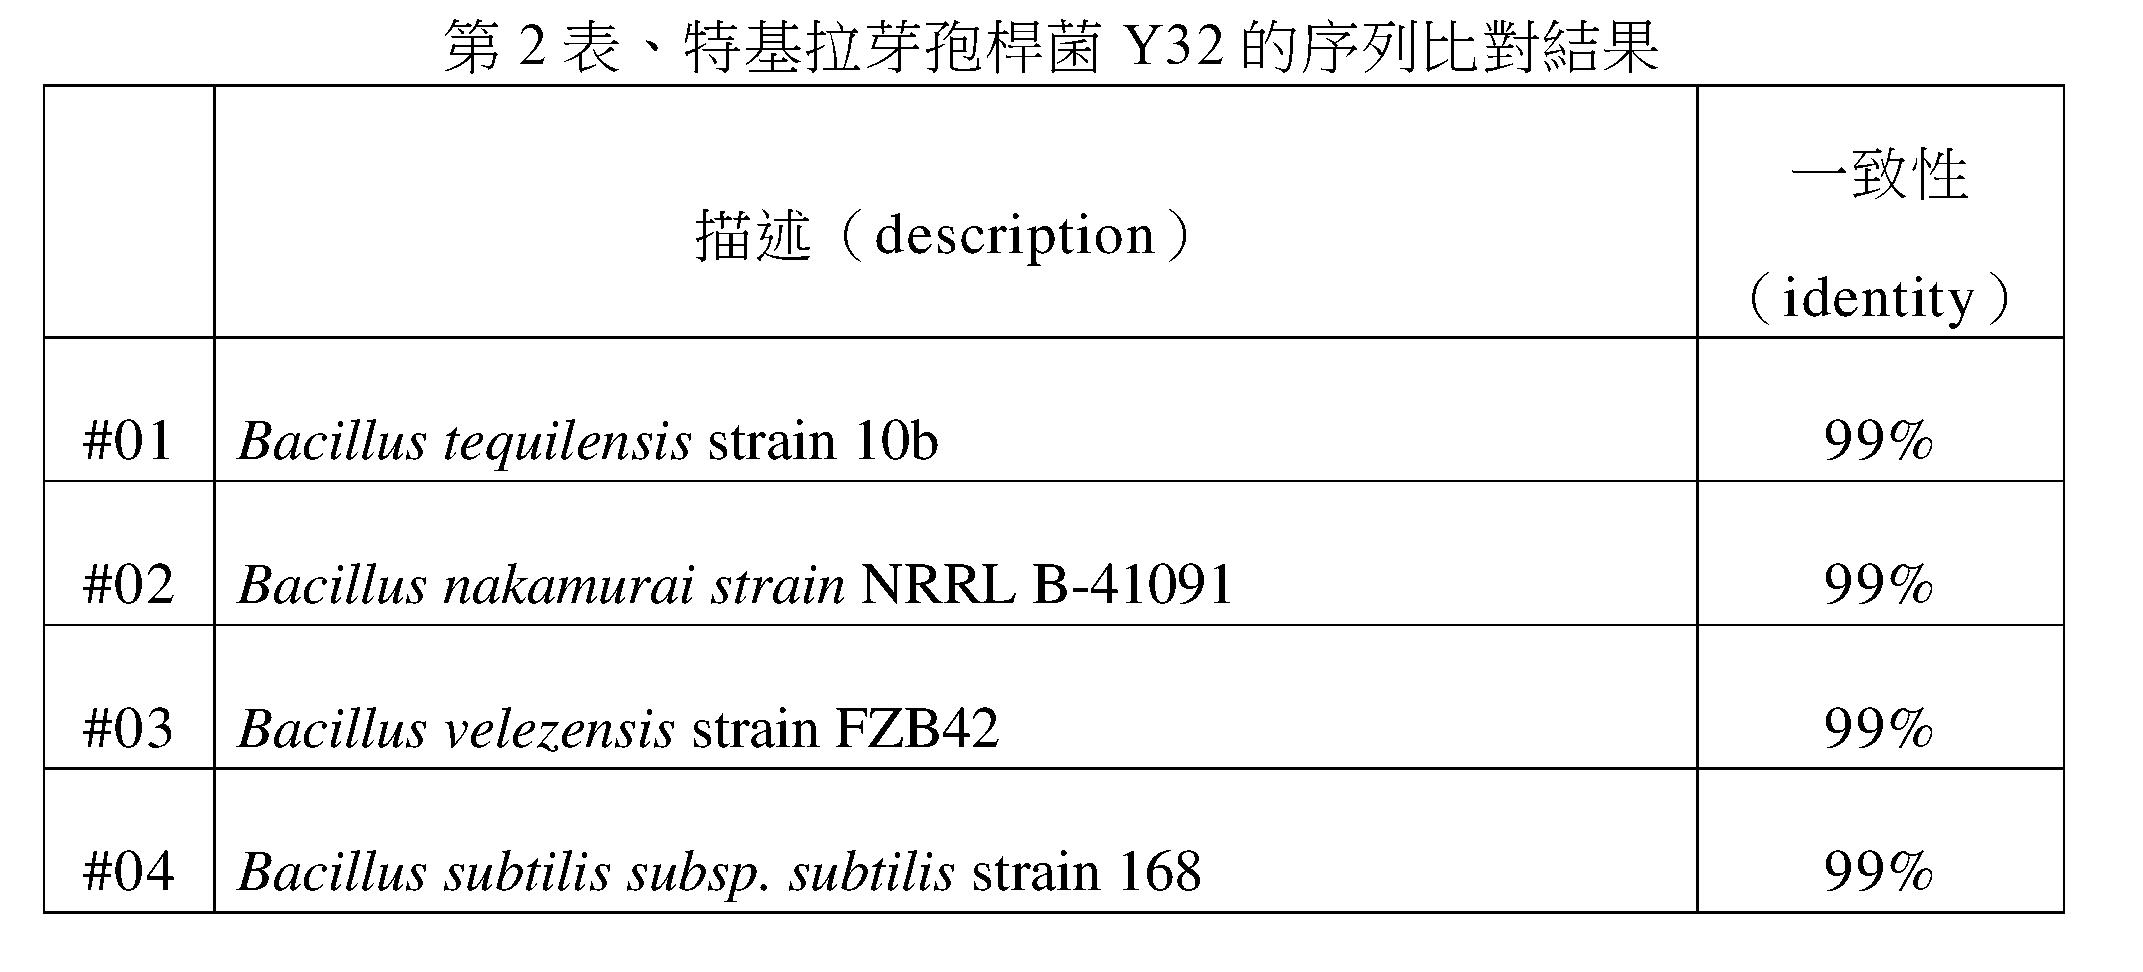 Figure 107145475-A0305-02-0006-3